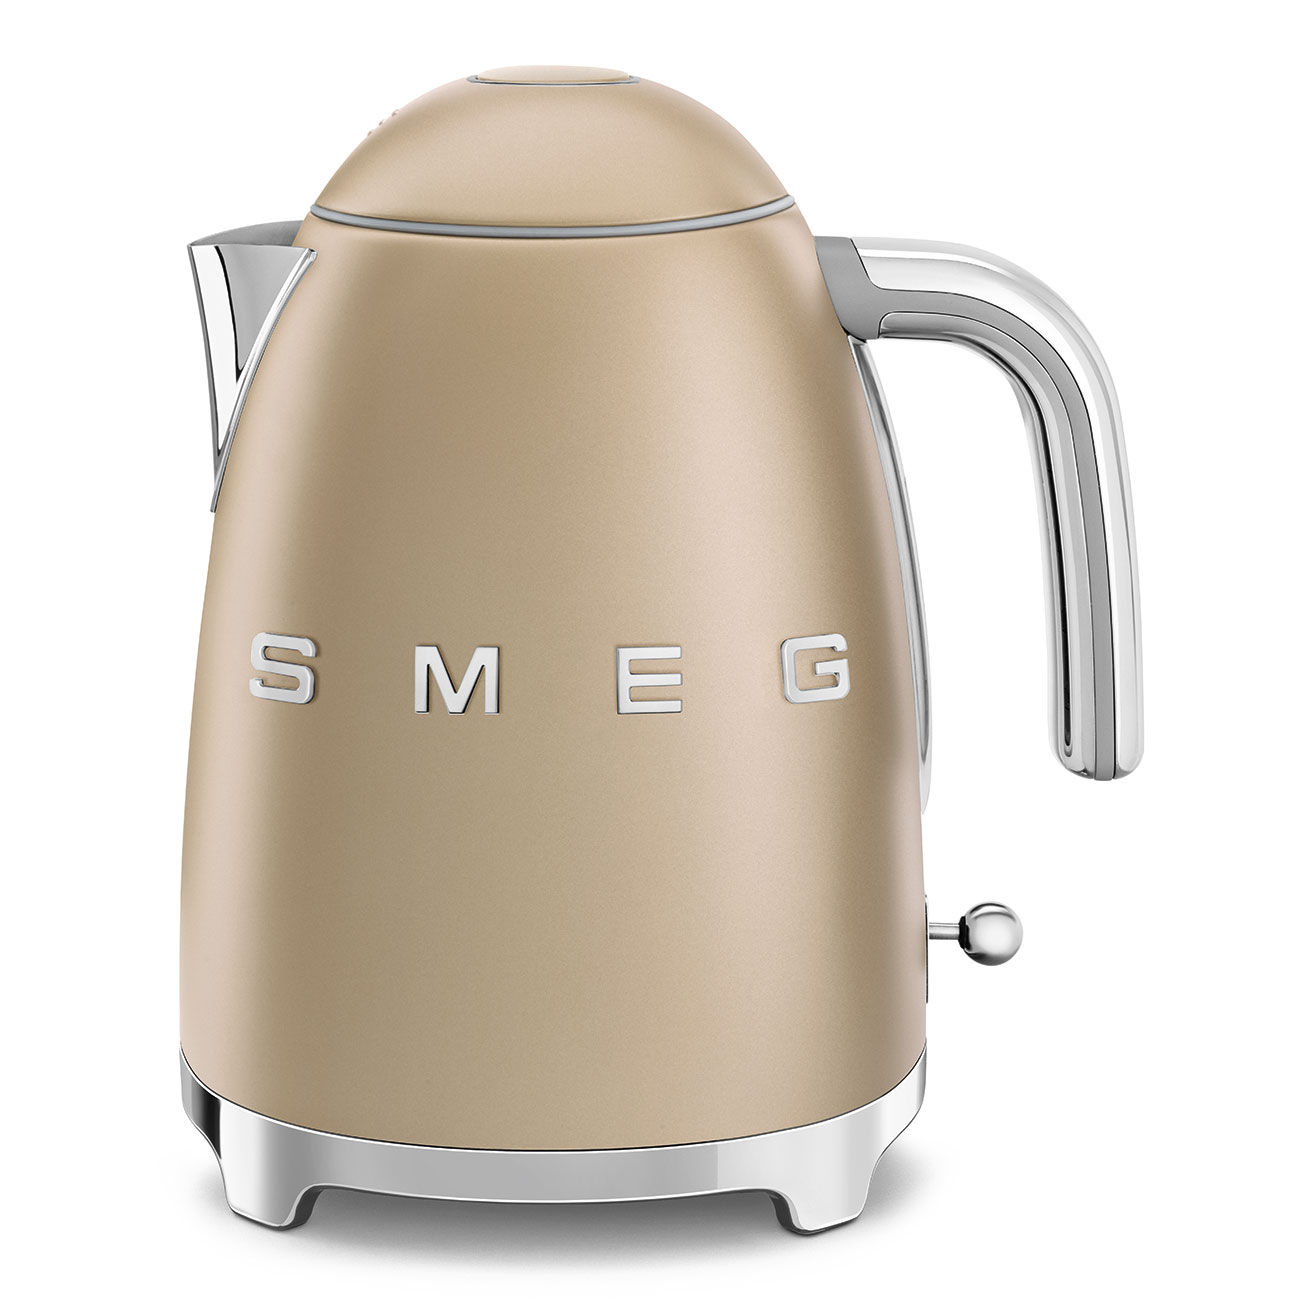 Онлайн каталог PROMENU: Чайник электрический Smeg 50 Style, объем 1,7 л, шампань  KLF03CHMEU